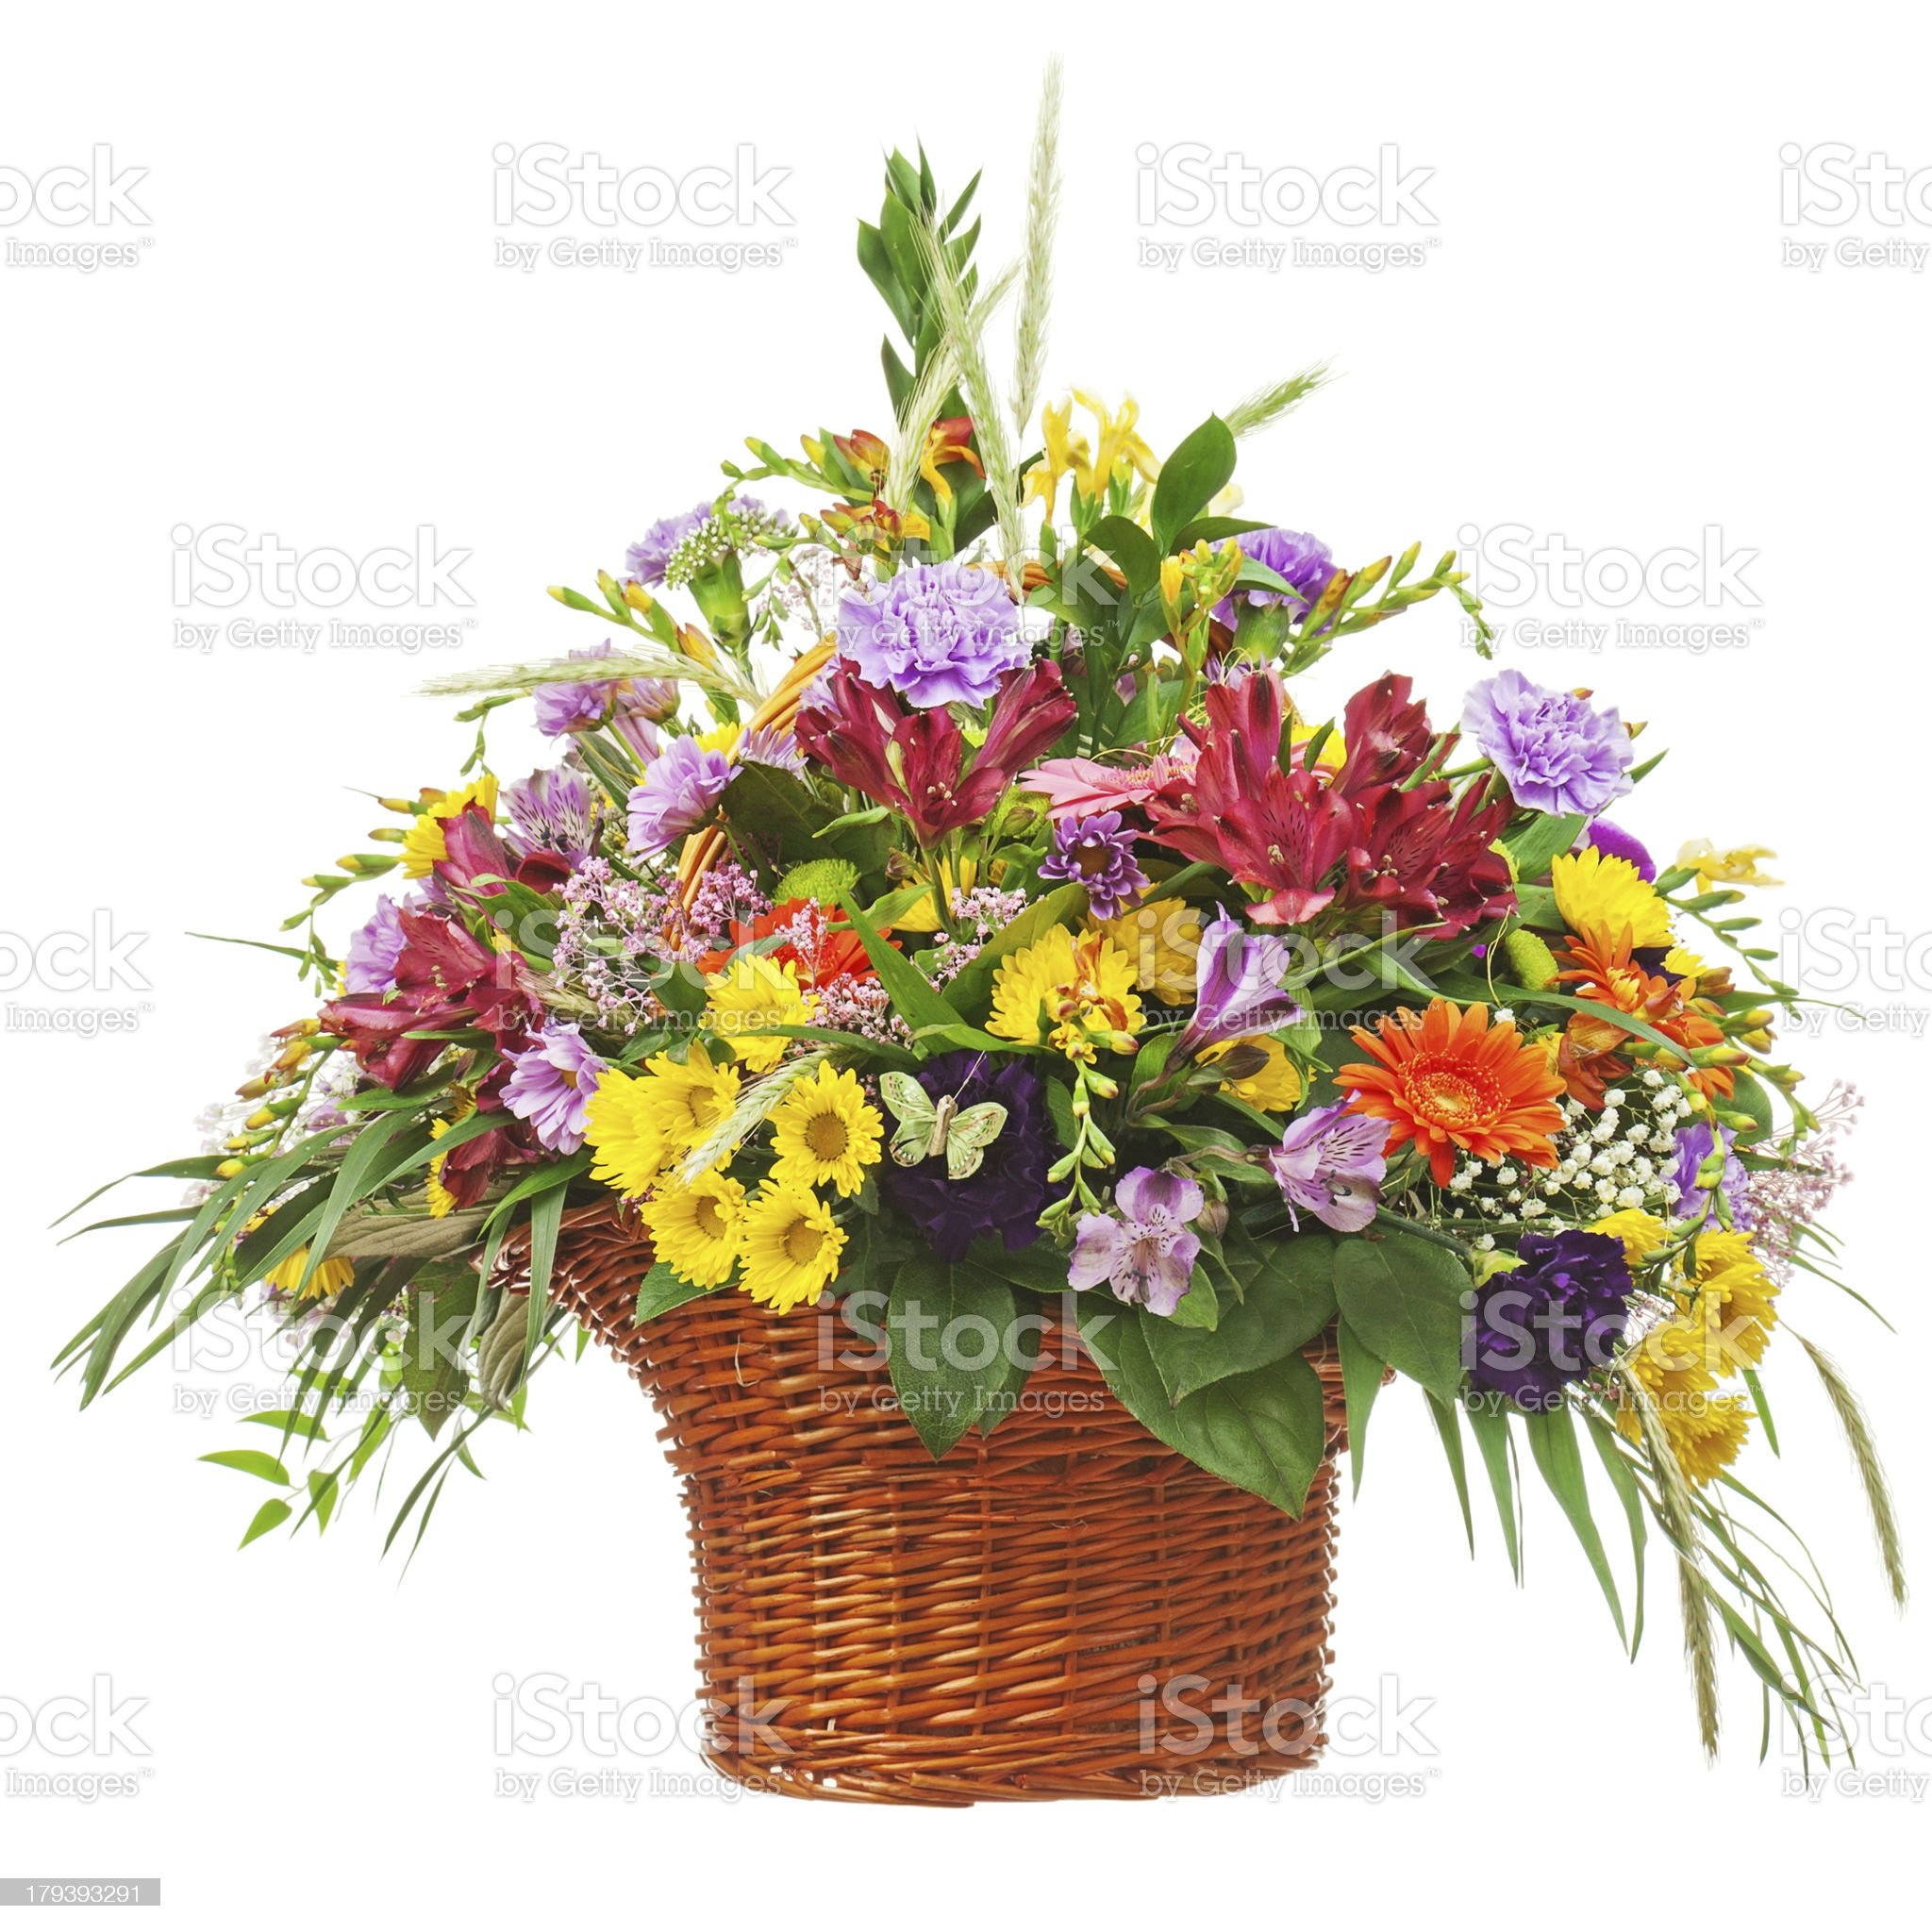 Flower bouquet arrangement centerpiece in wicker basket isolated royalty-free stock photo